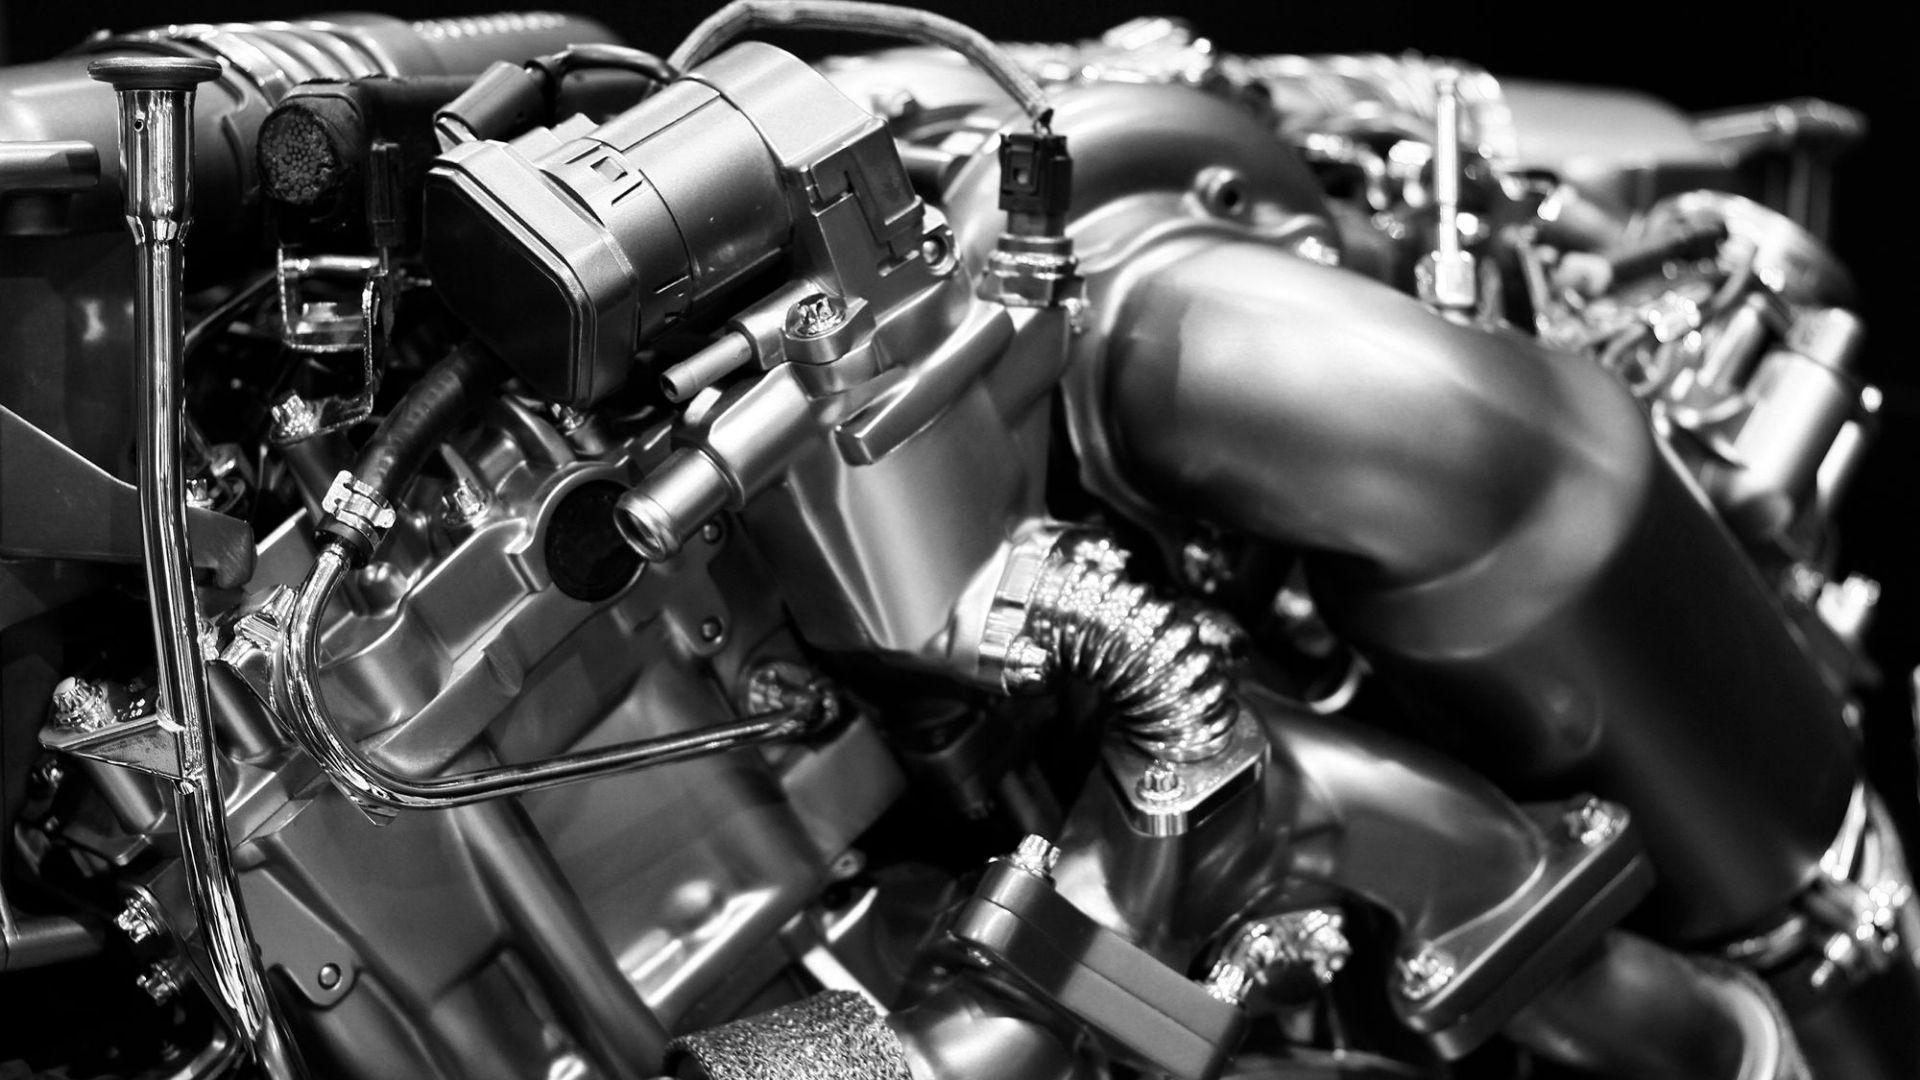 000 taller vehículos coches automóviles motor 2